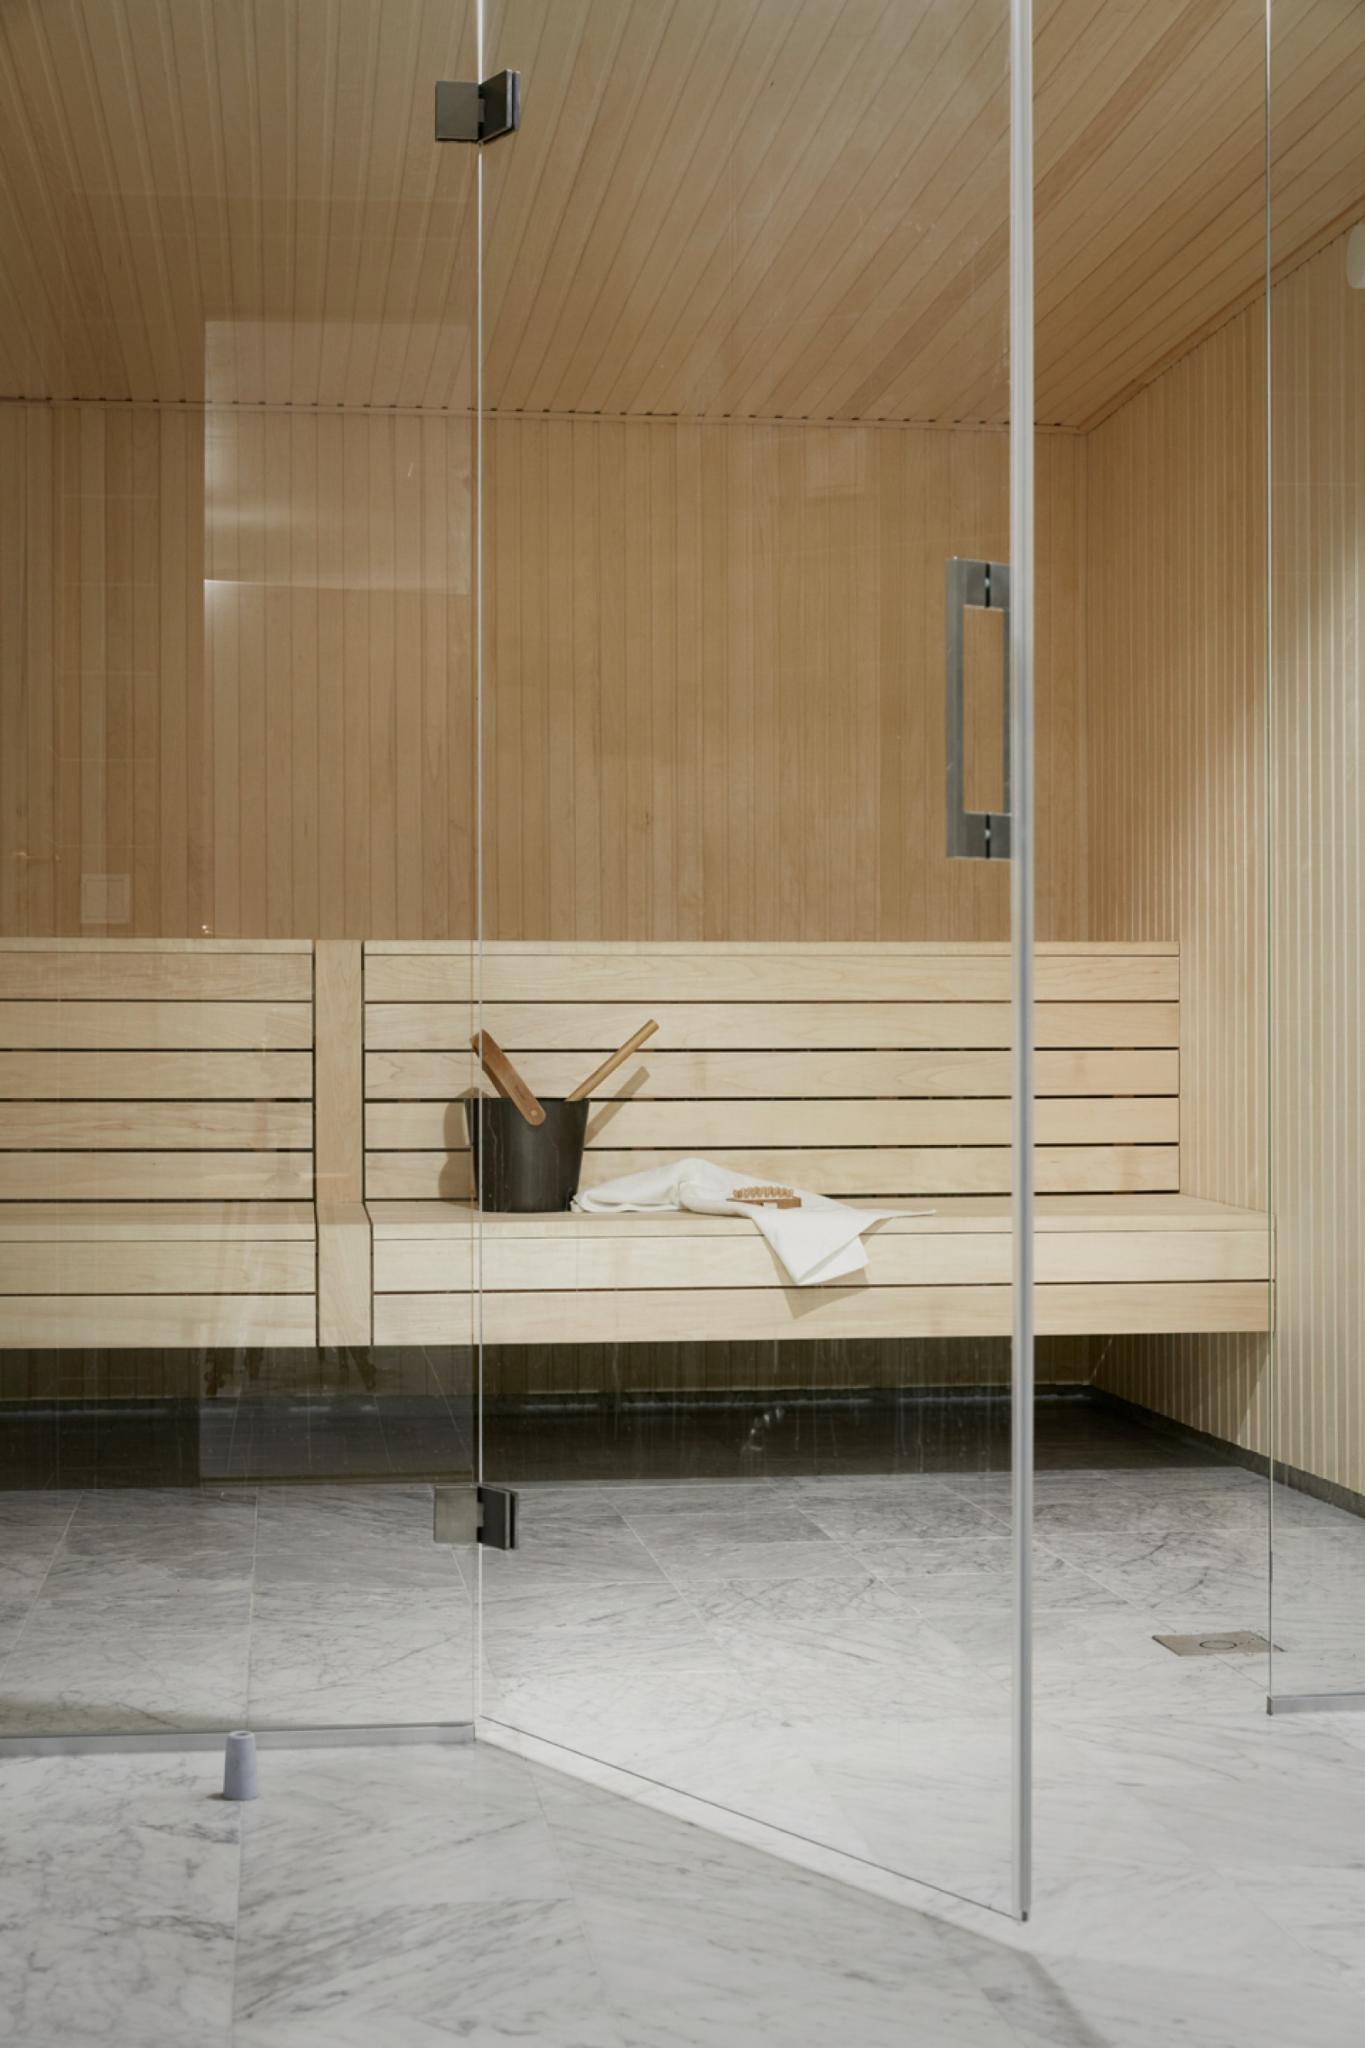 textilgatan 25 fantastic frank. Black Bedroom Furniture Sets. Home Design Ideas